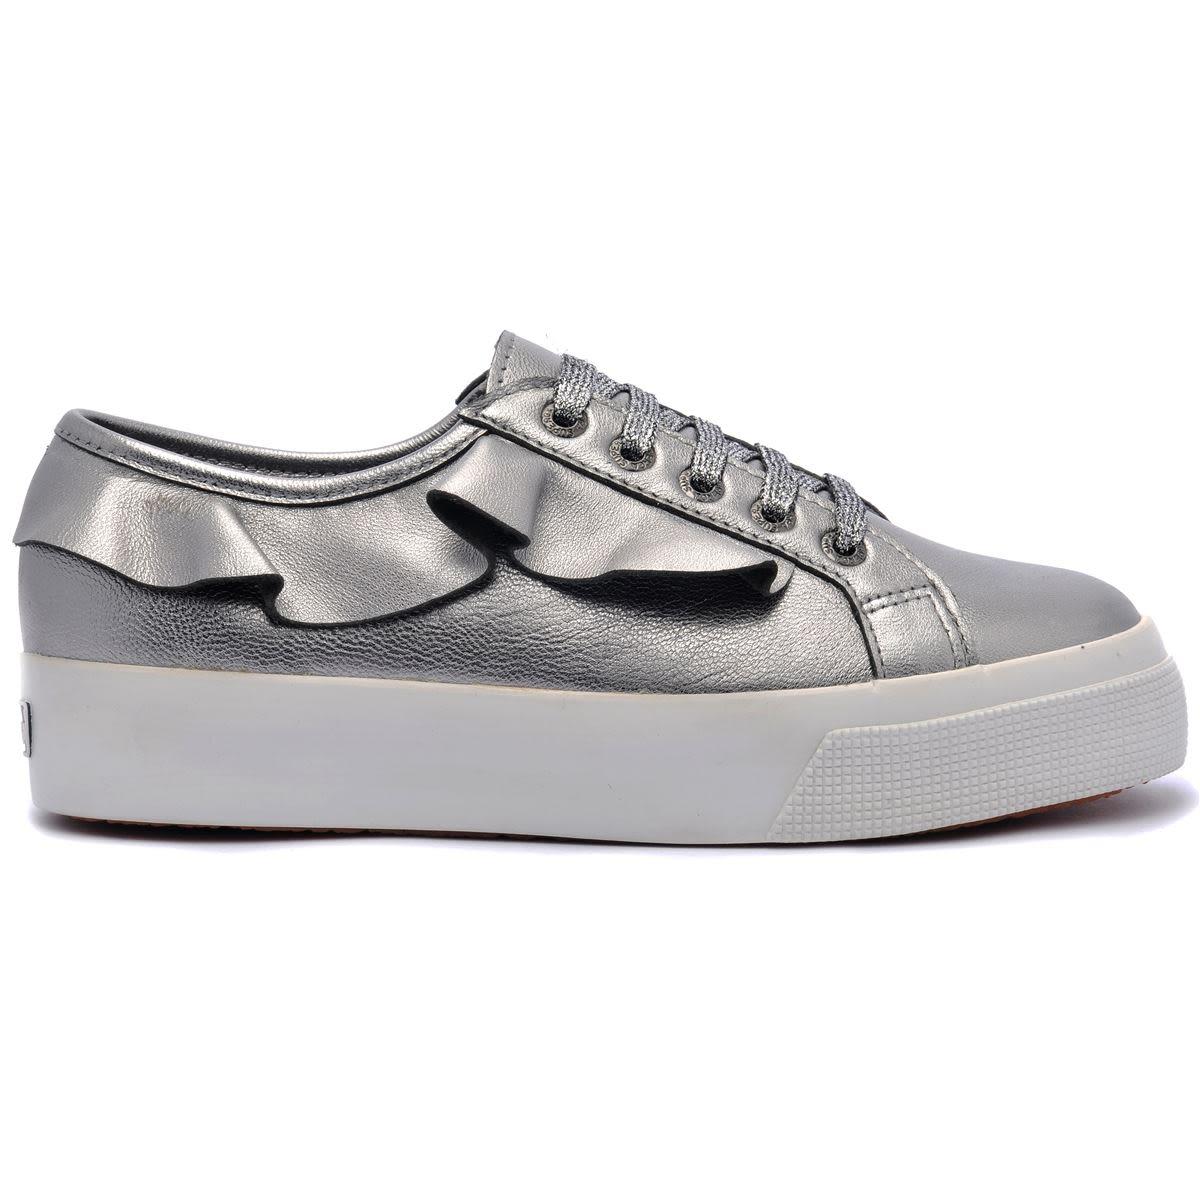 Sneaker 10768889Italist Superga Metal 2730 Gun X0wkNOP8n